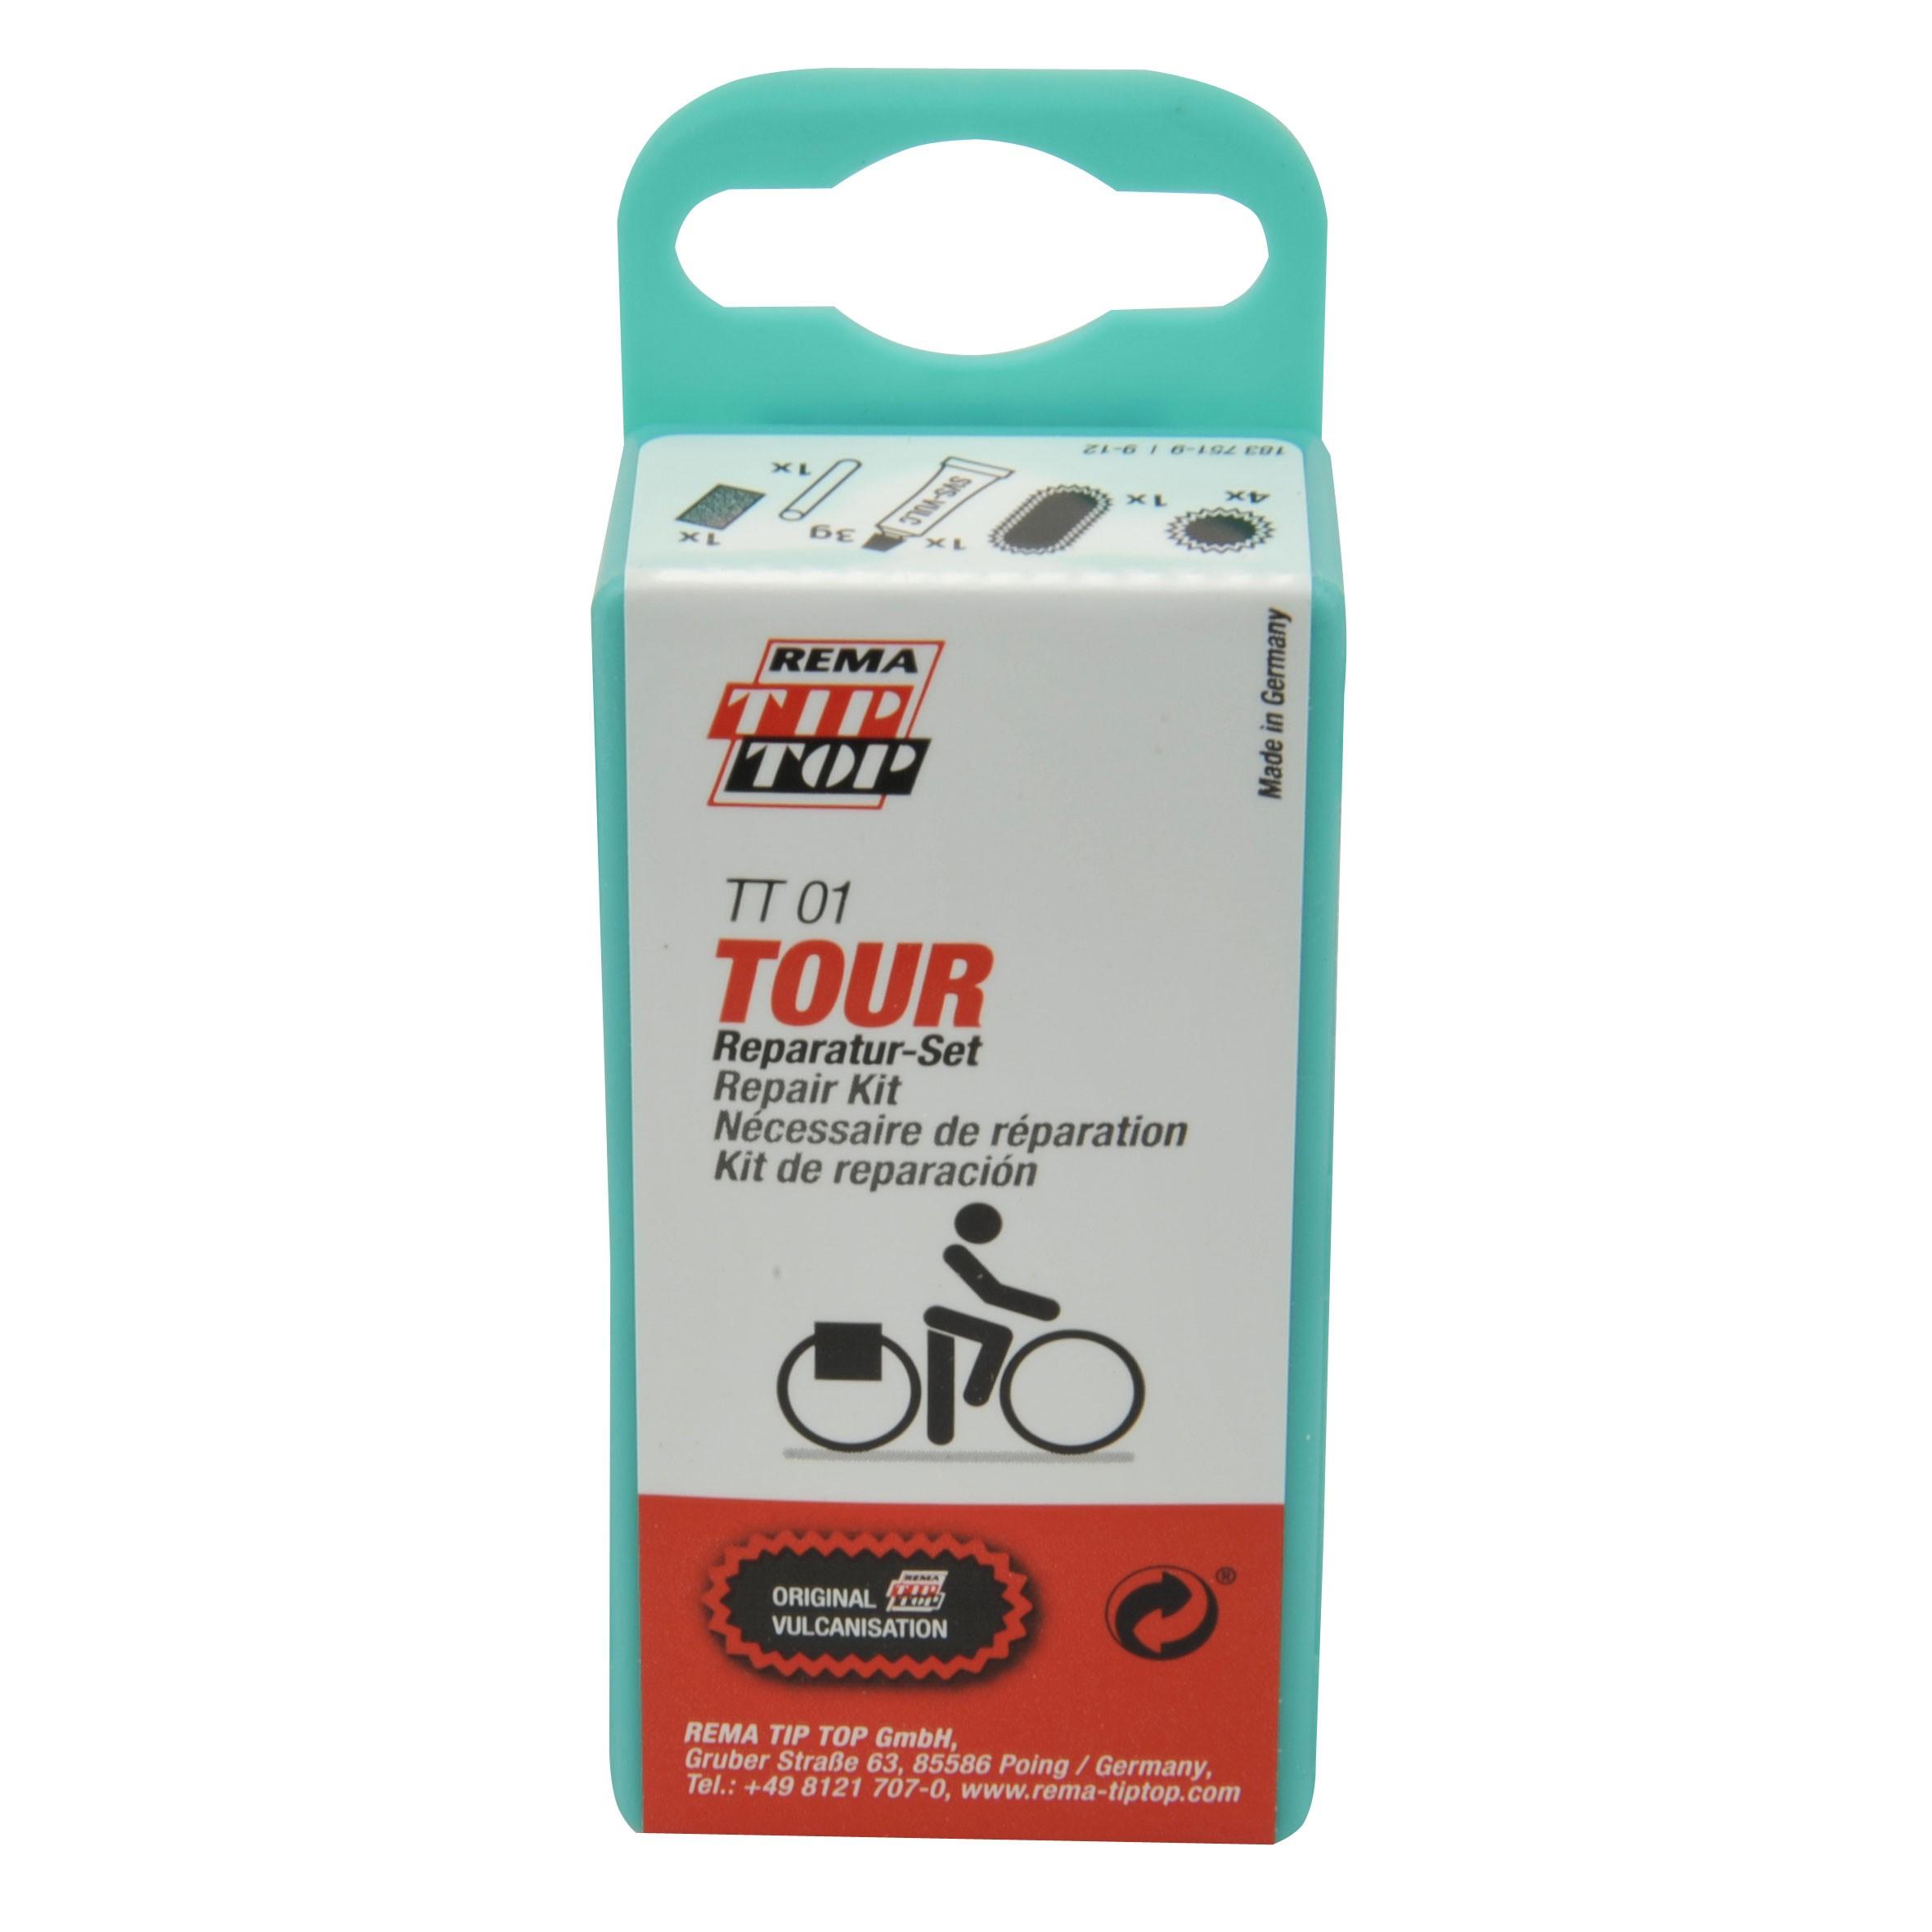 Flickzeug Fahrrad / TIP-TOP Flickzeug TT 01 Tour Bild 2